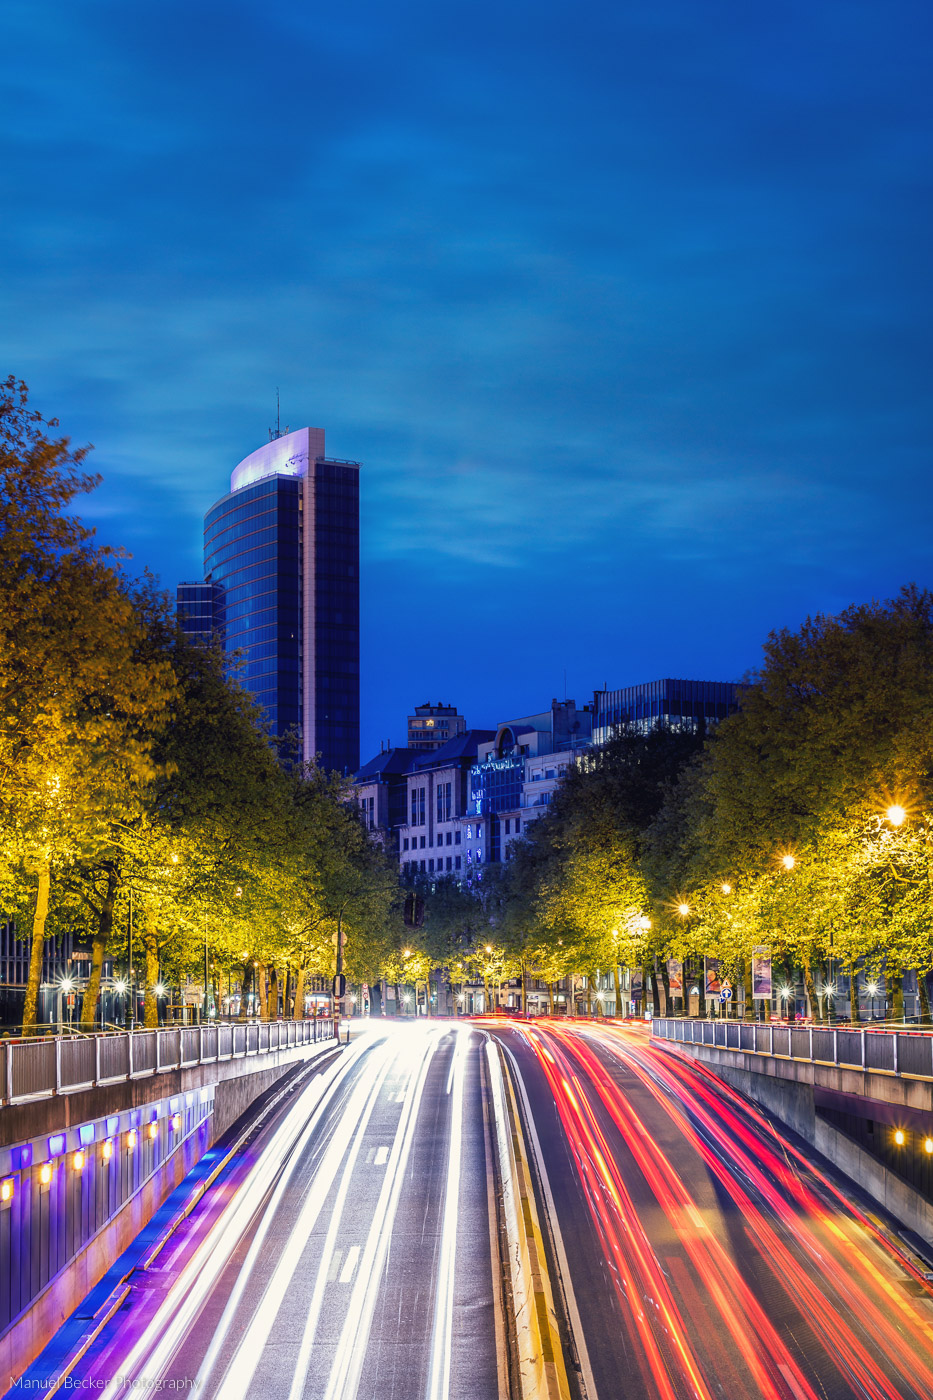 City alley in Brussels, Belgium